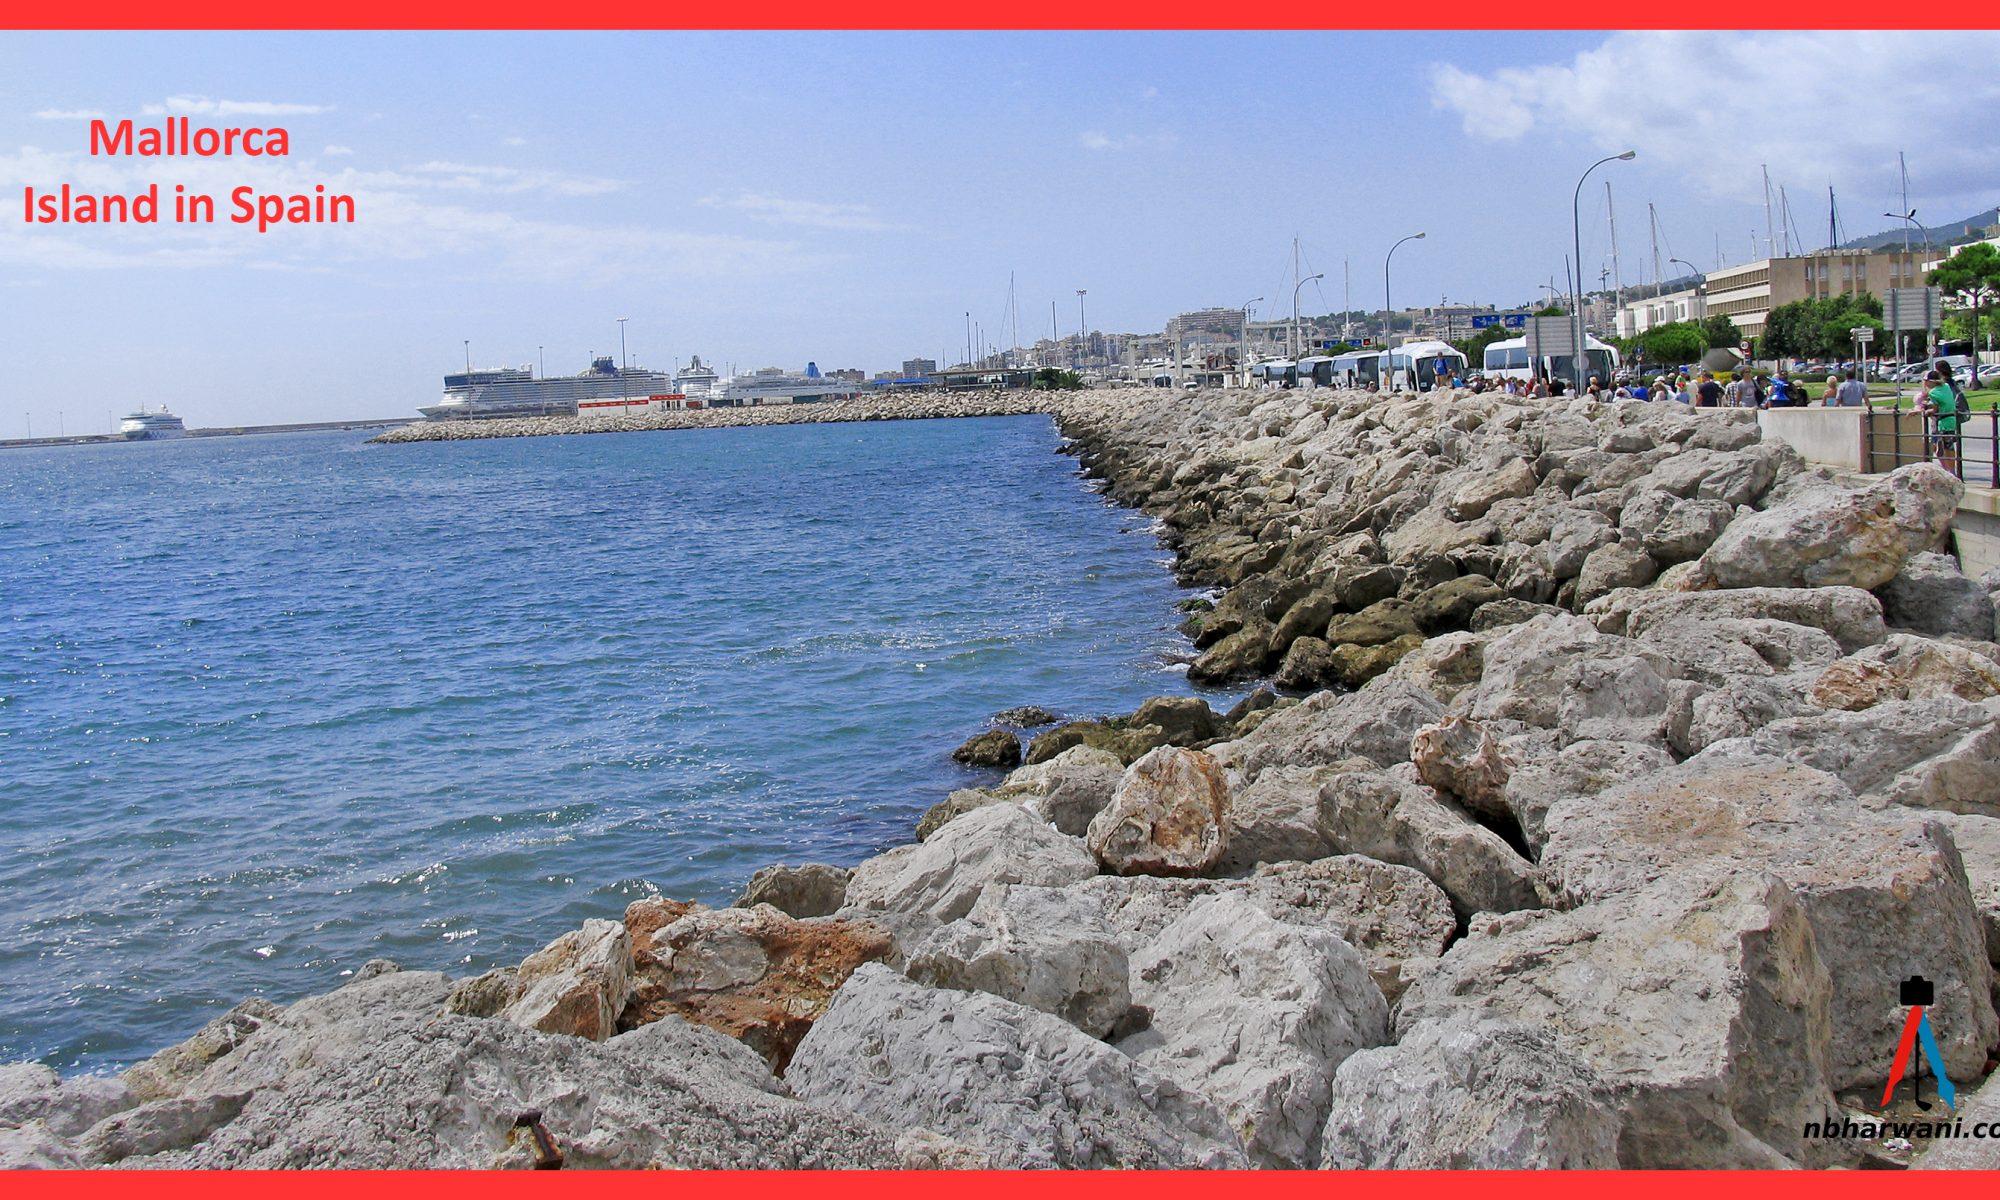 Mallorca (Majorca) is one of Spain's Islands in the Mediterranean. (Dr. Noorali Bharwani)